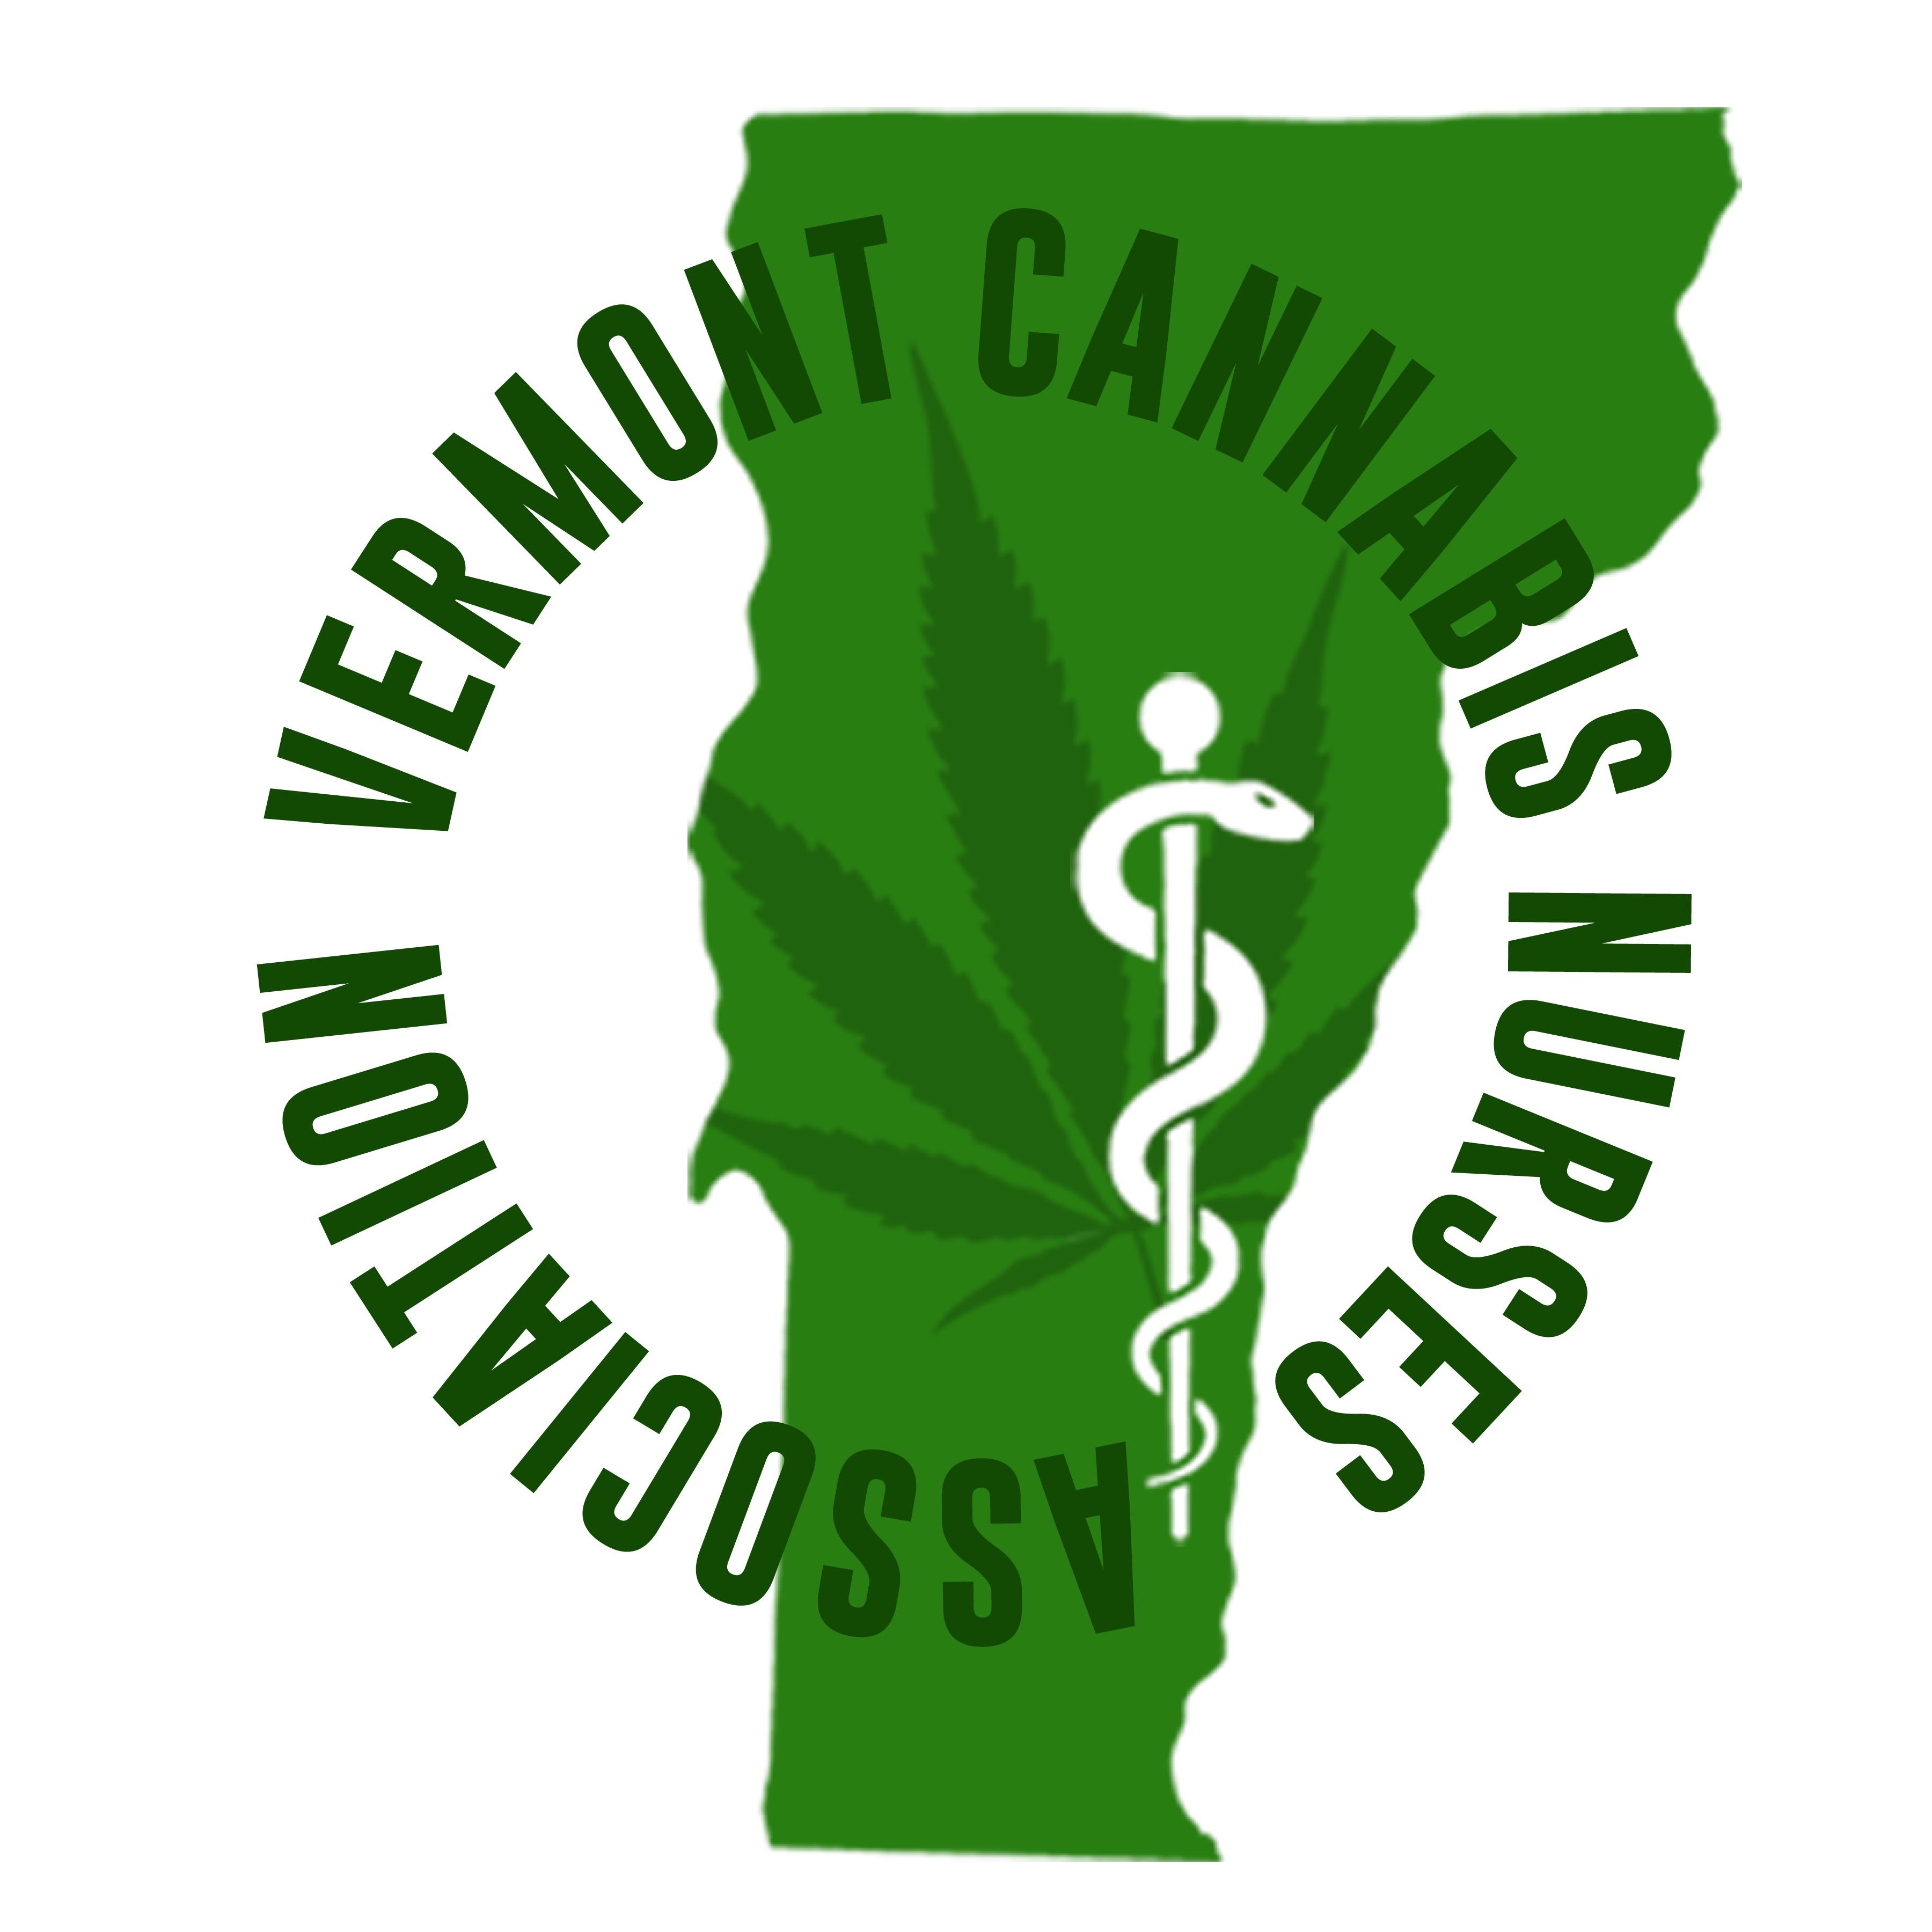 NurseGrown Organics is a member of the Vermont Cannabis Nurses Association